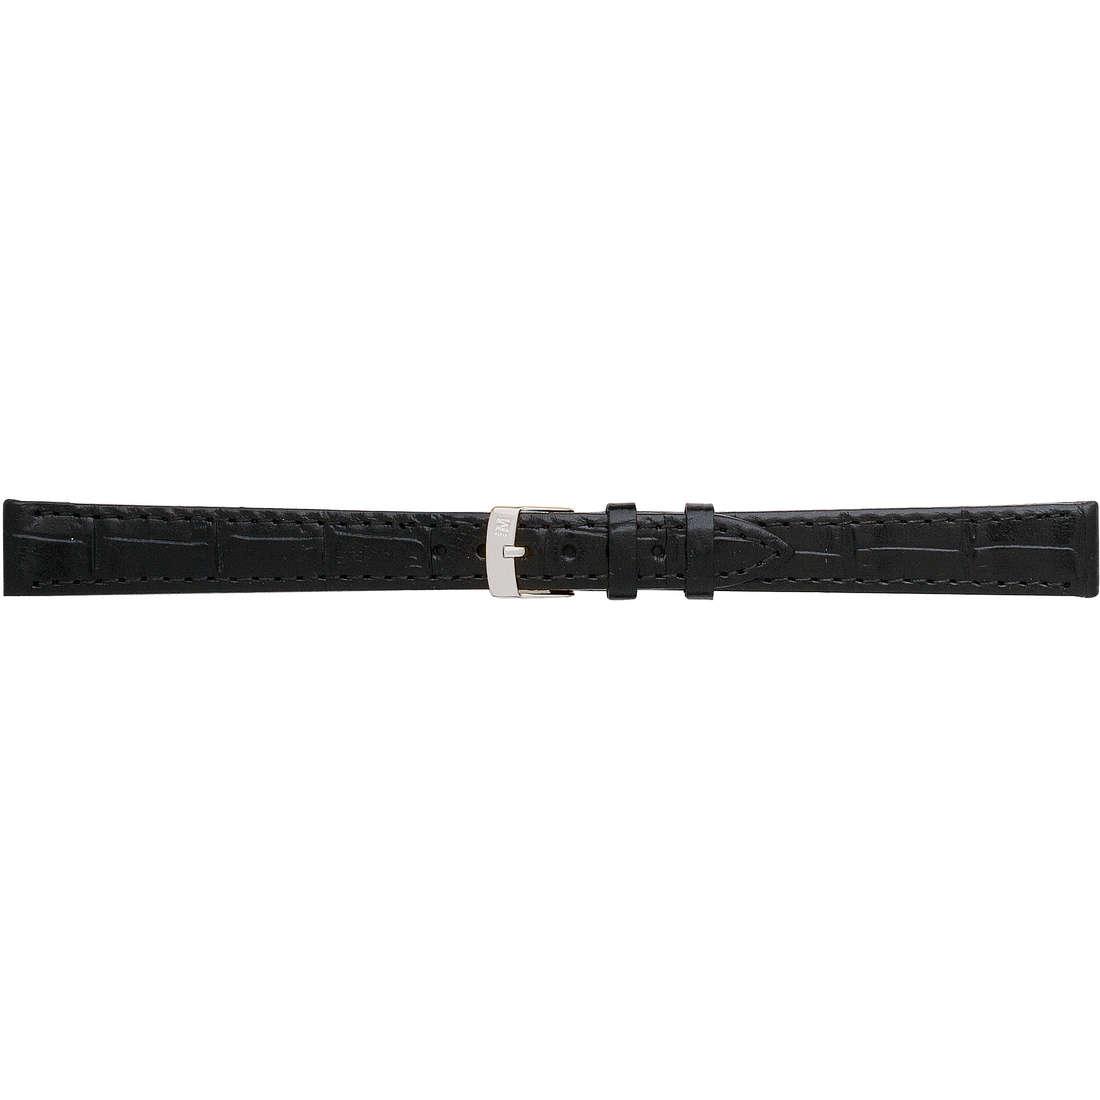 montre bande de montres unisex Morellato I Lunghi A01Y2524656019CR12